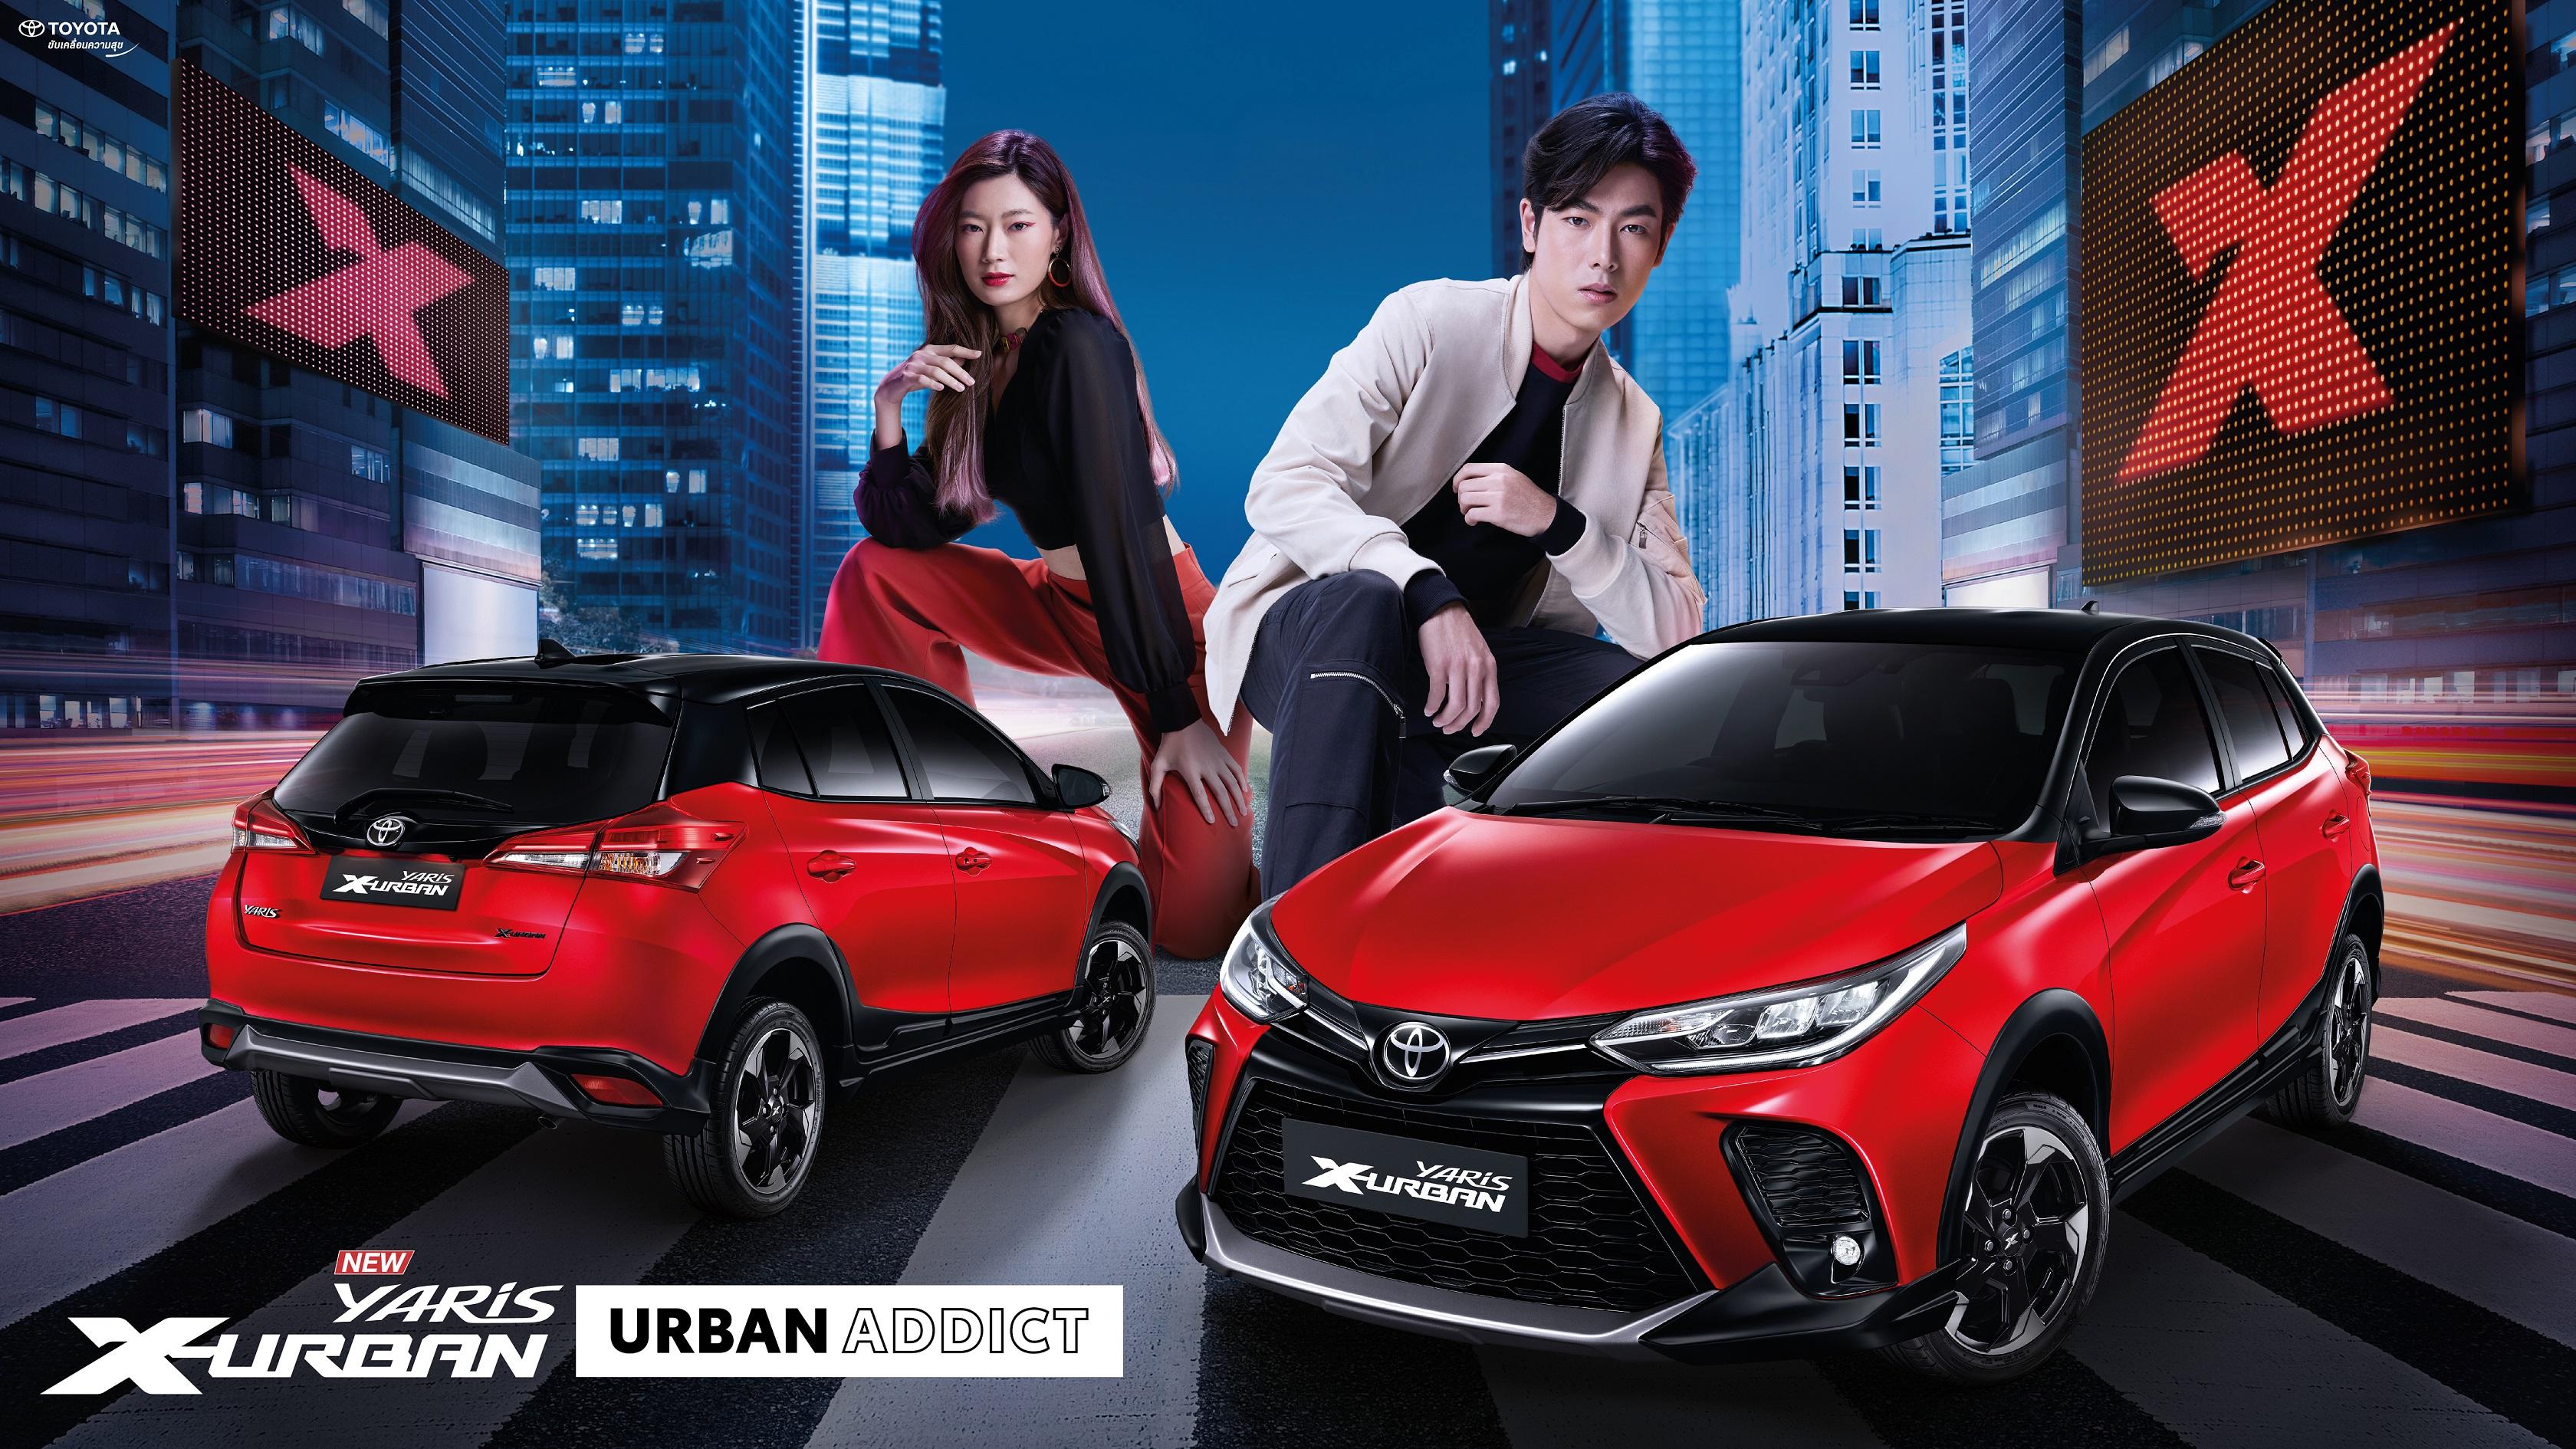 Toyota Yaris Ativ 2021 X-Urban Flash II Package AutoinfoOnline (11)